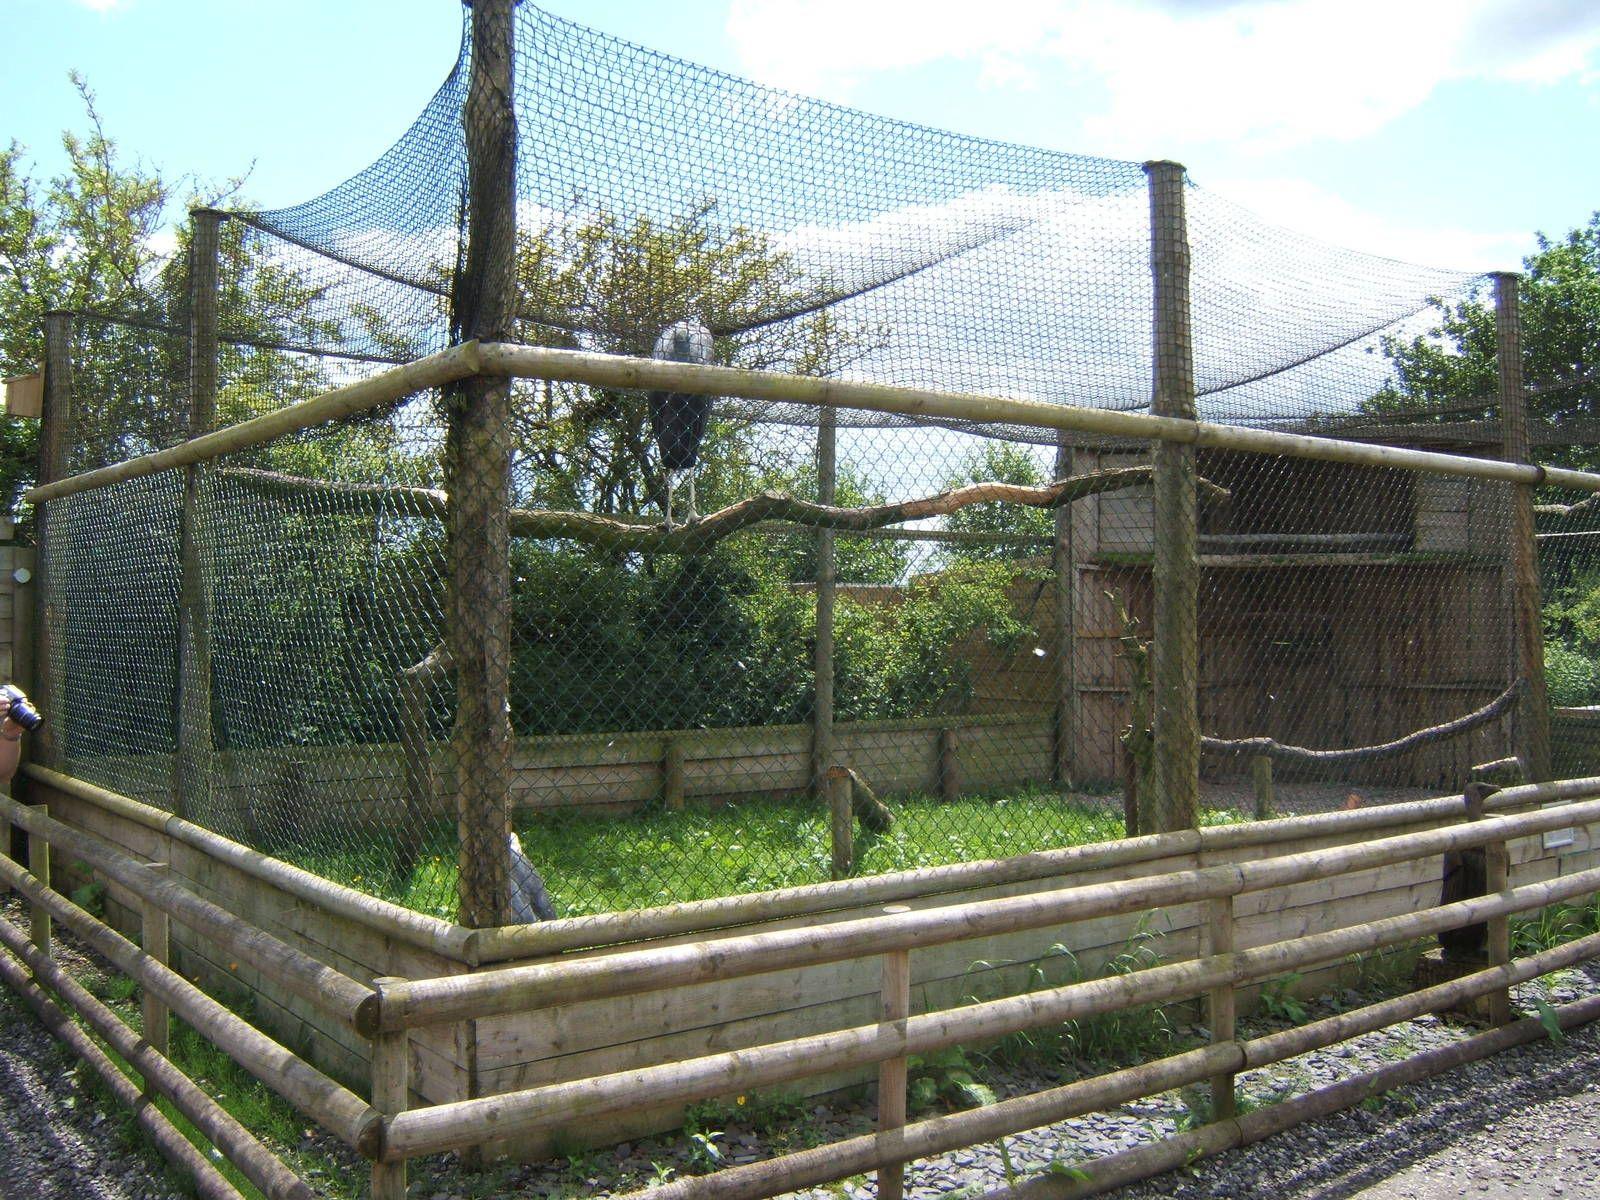 Gambar terkait   Zoo architecture, Outdoor decor, Outdoor